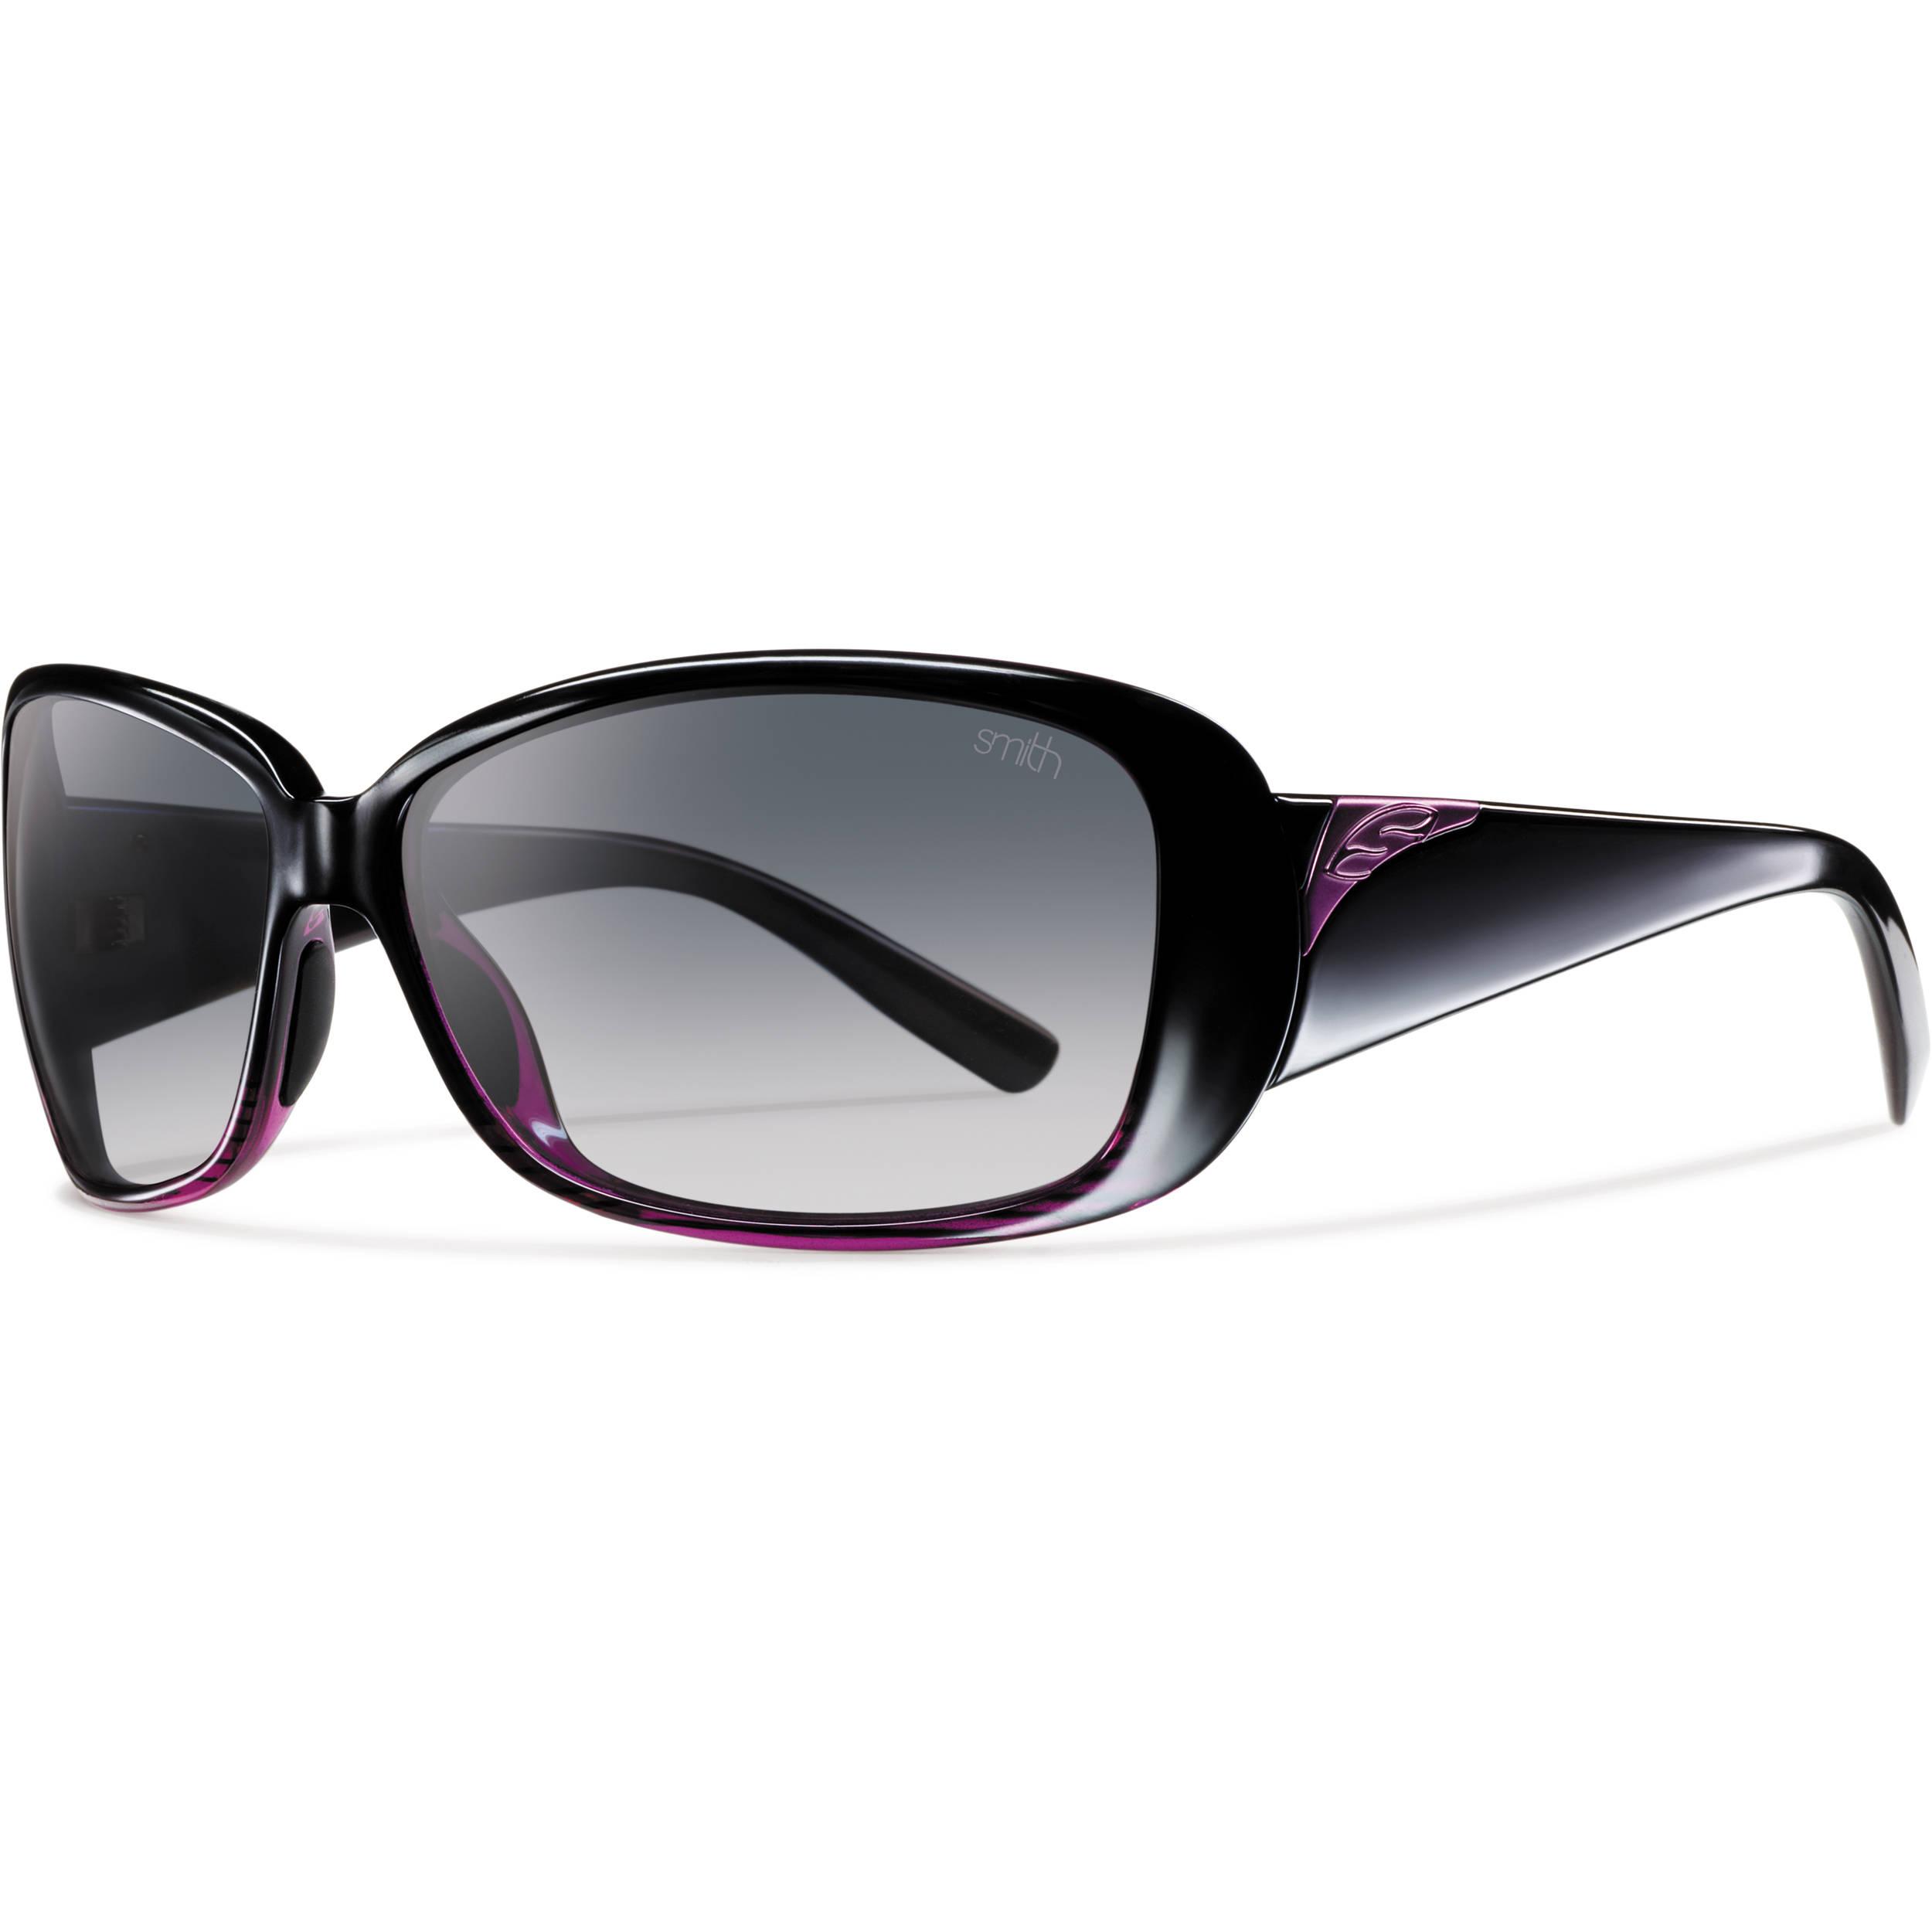 8744bbb698b Smith Optics Sunglasses Dealers